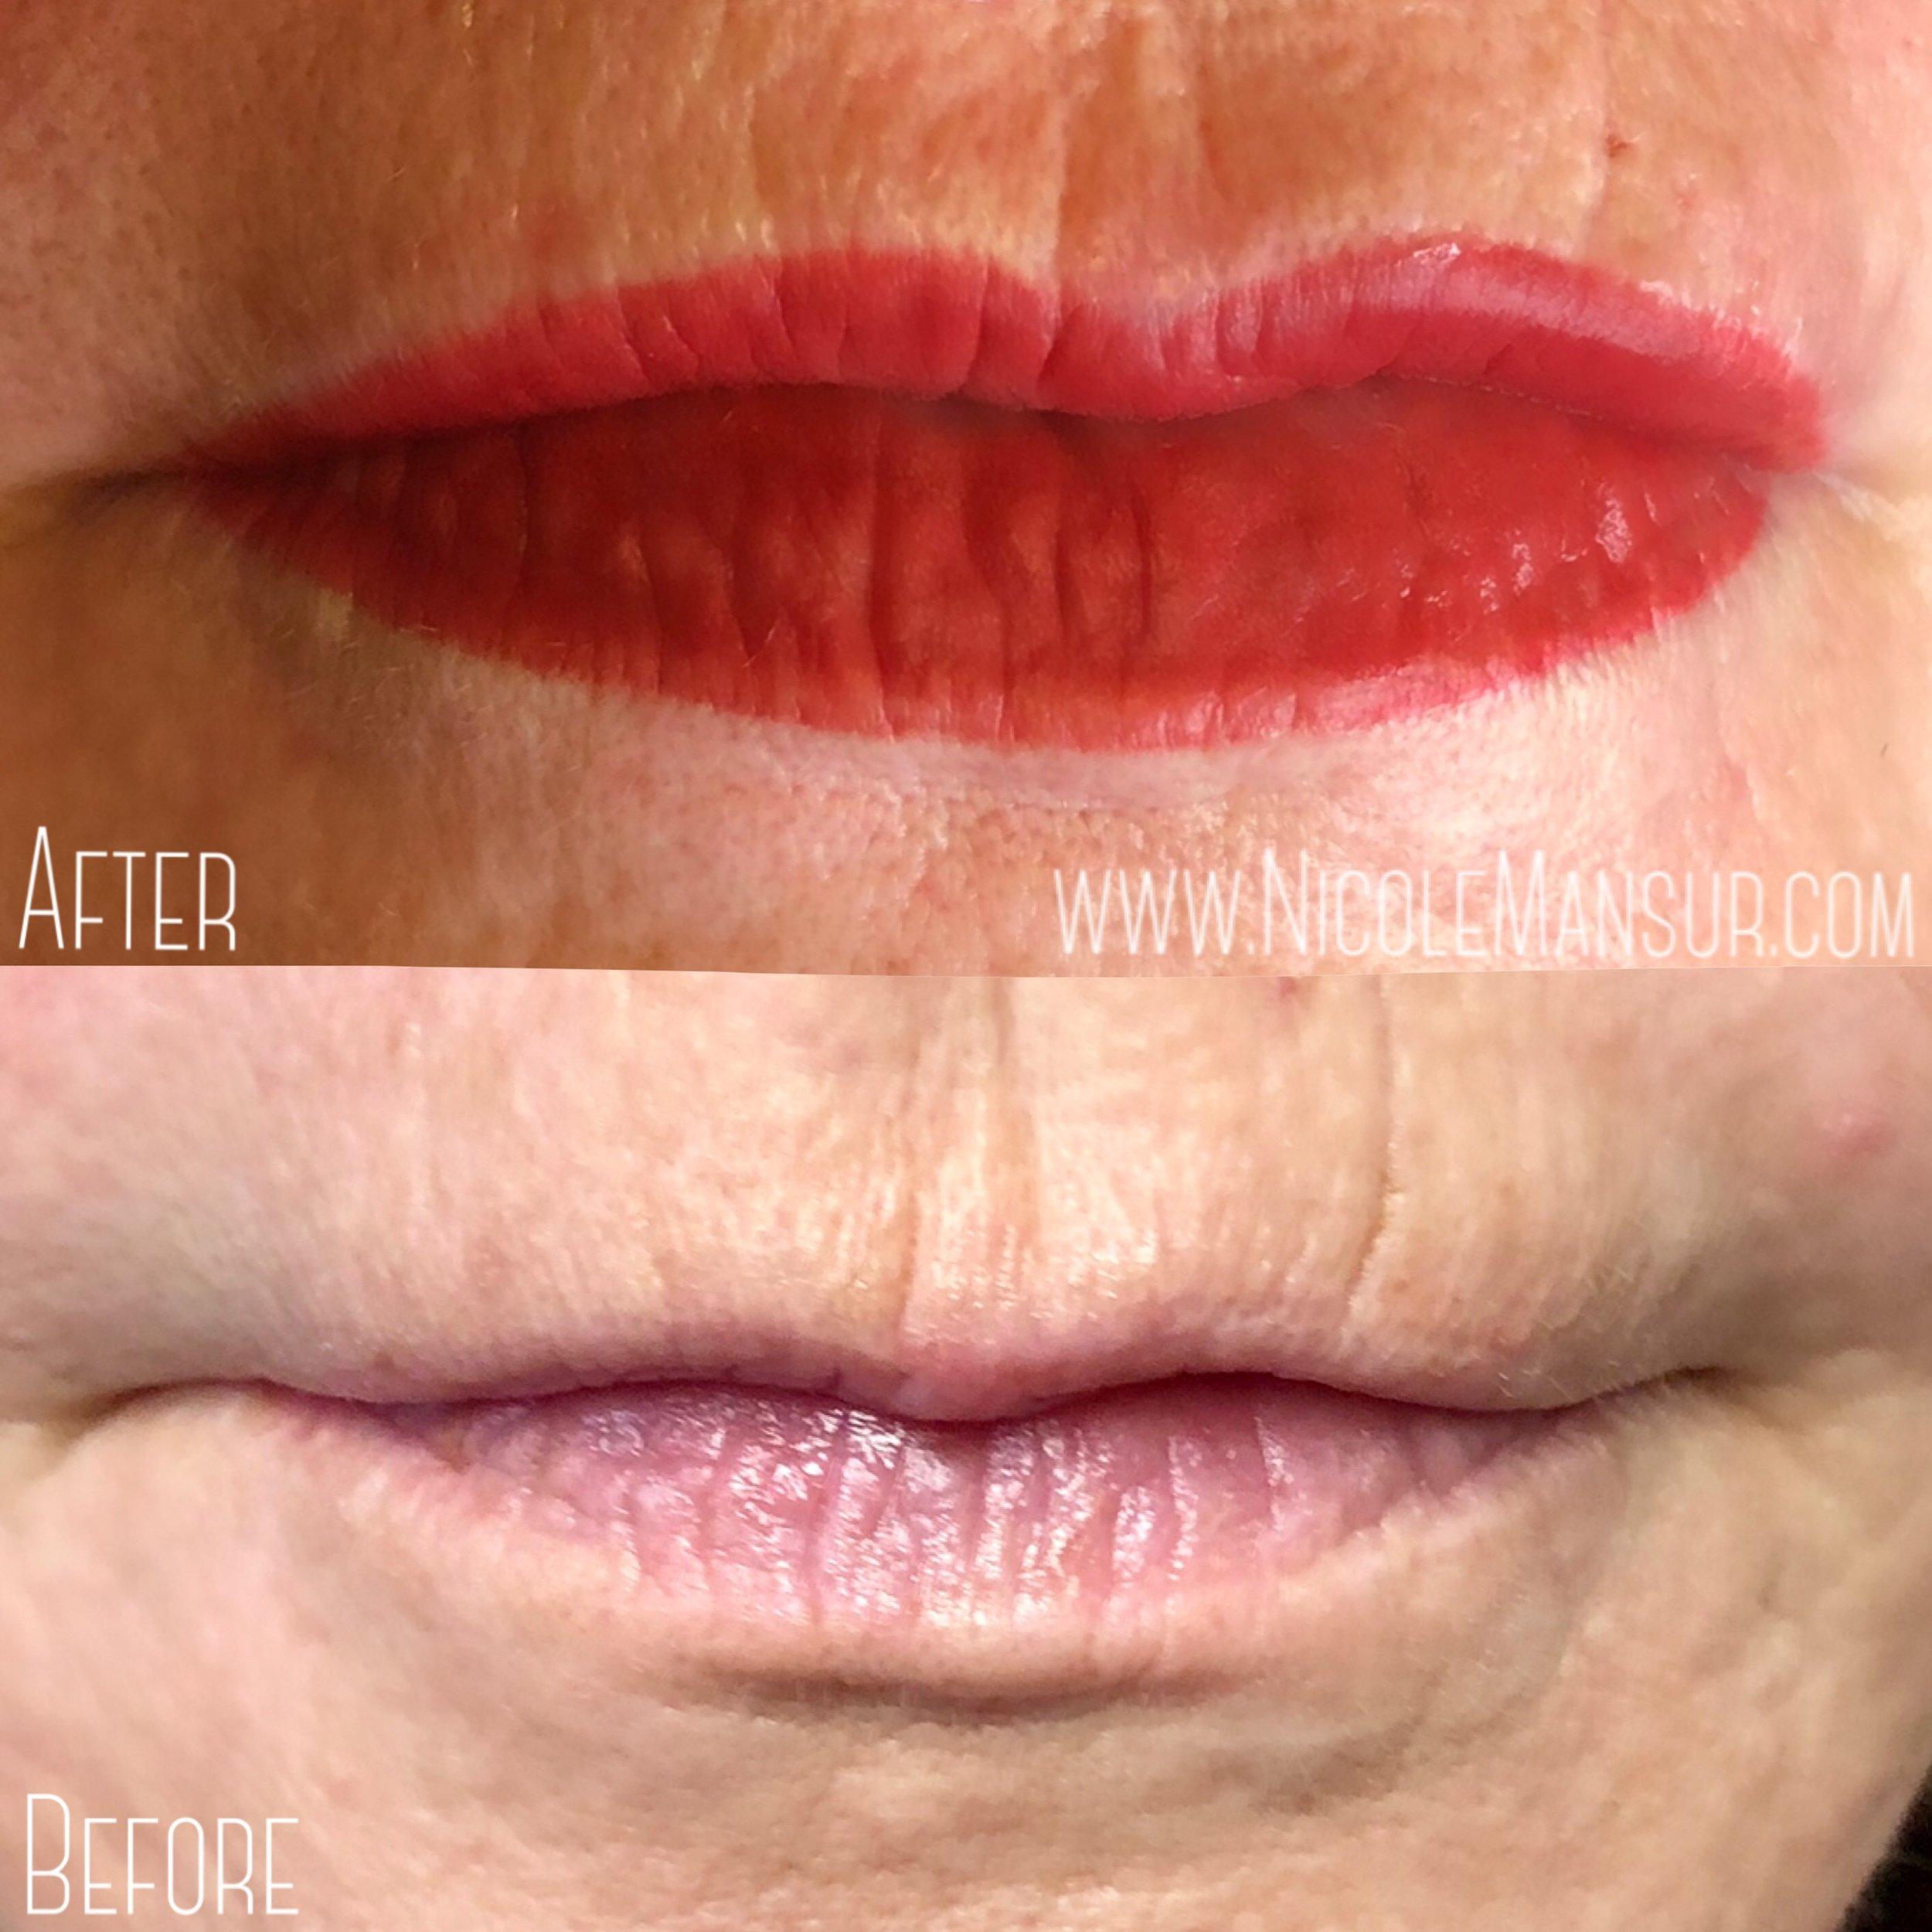 Permanent Lip Color Permanent Lip Blushing Permanent Lip Liner